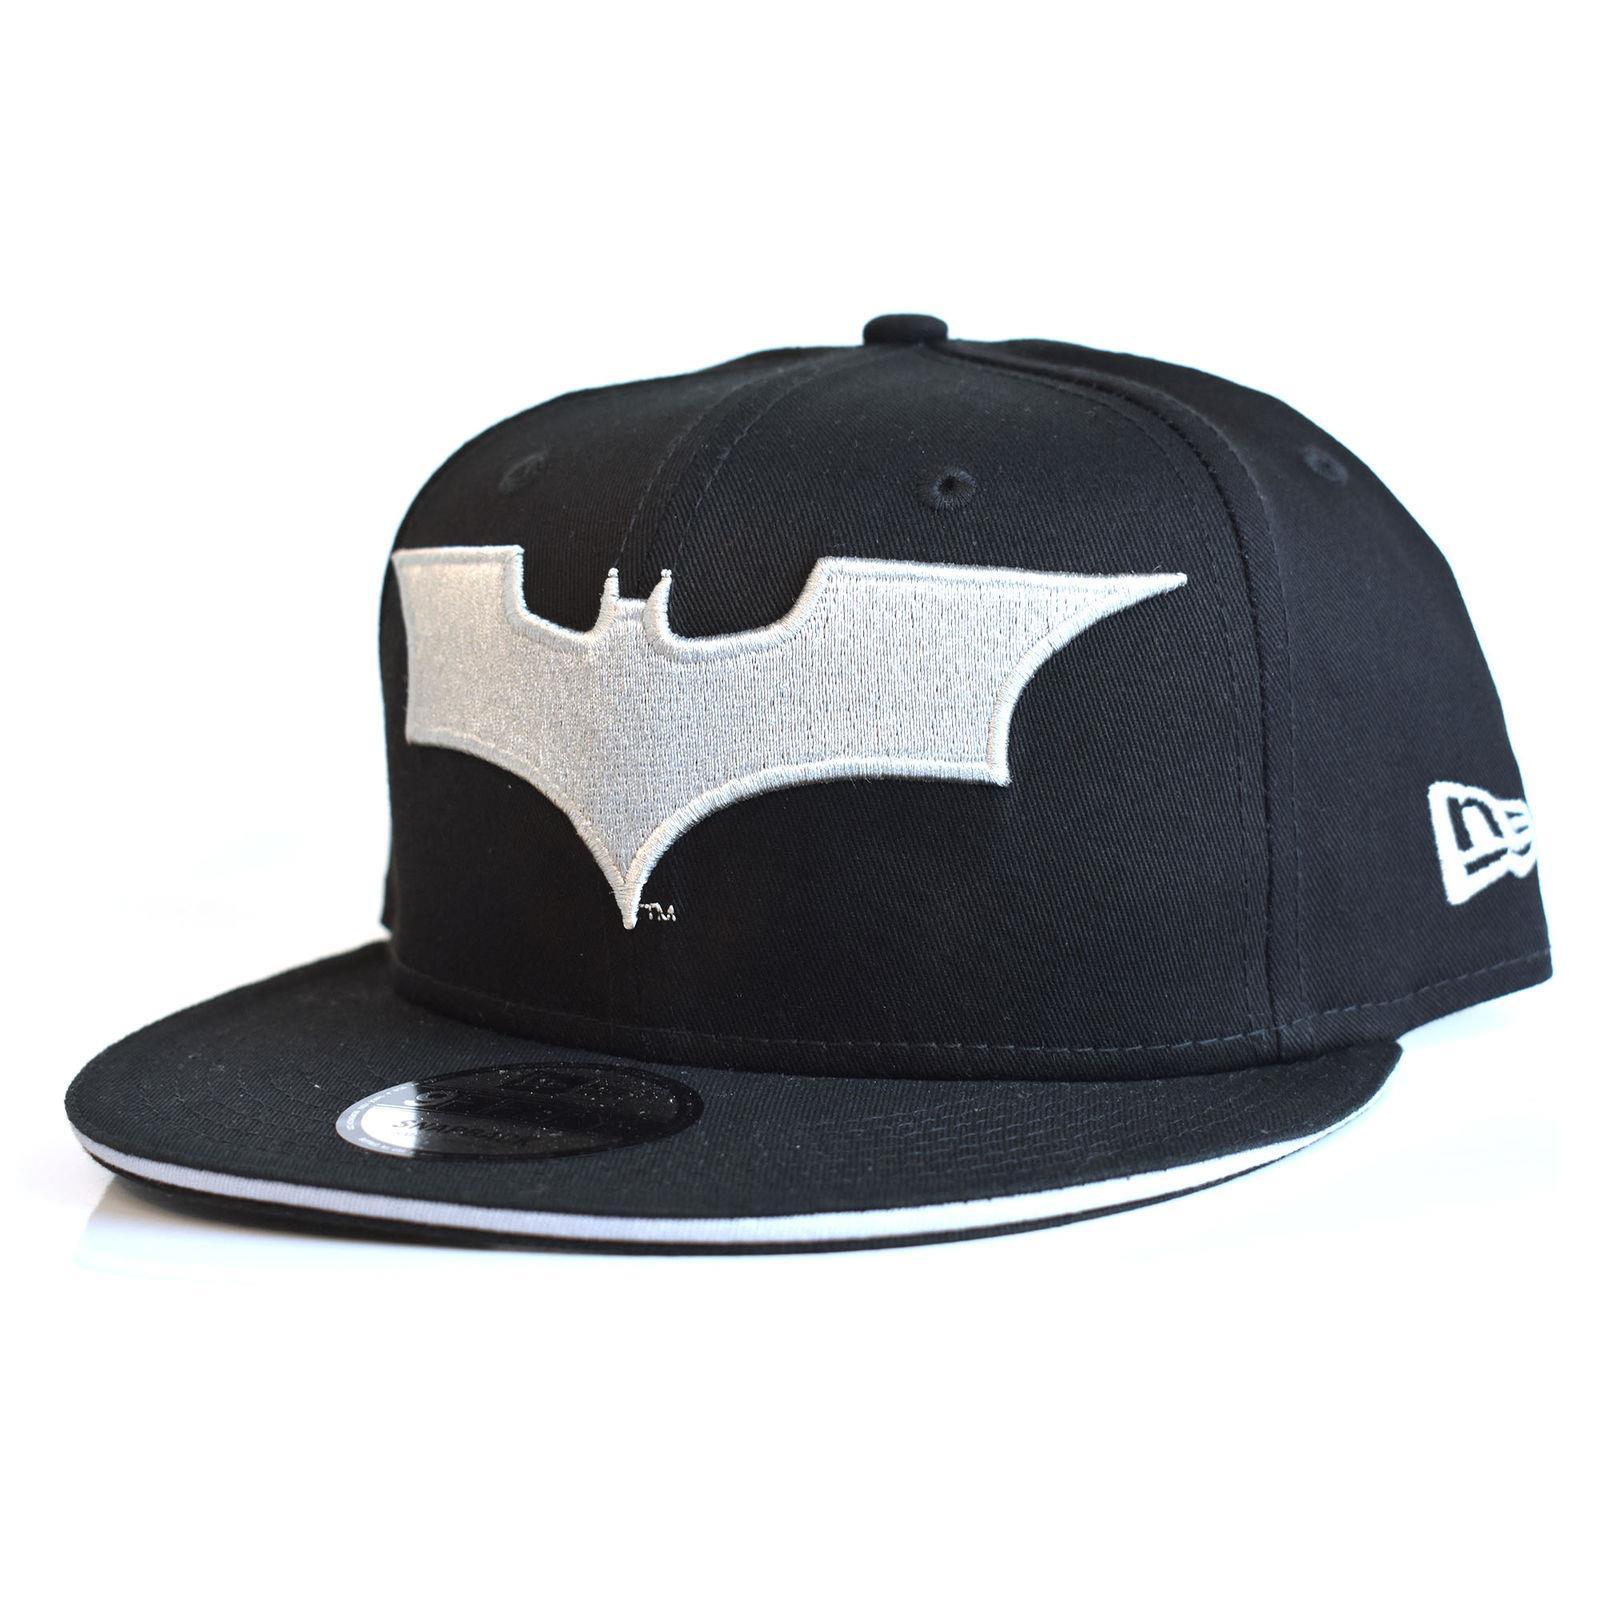 New Era Batman 9fifty GORRA SNAPBACK negro NUEVO CON ETIQUETAS  941d7e1c708